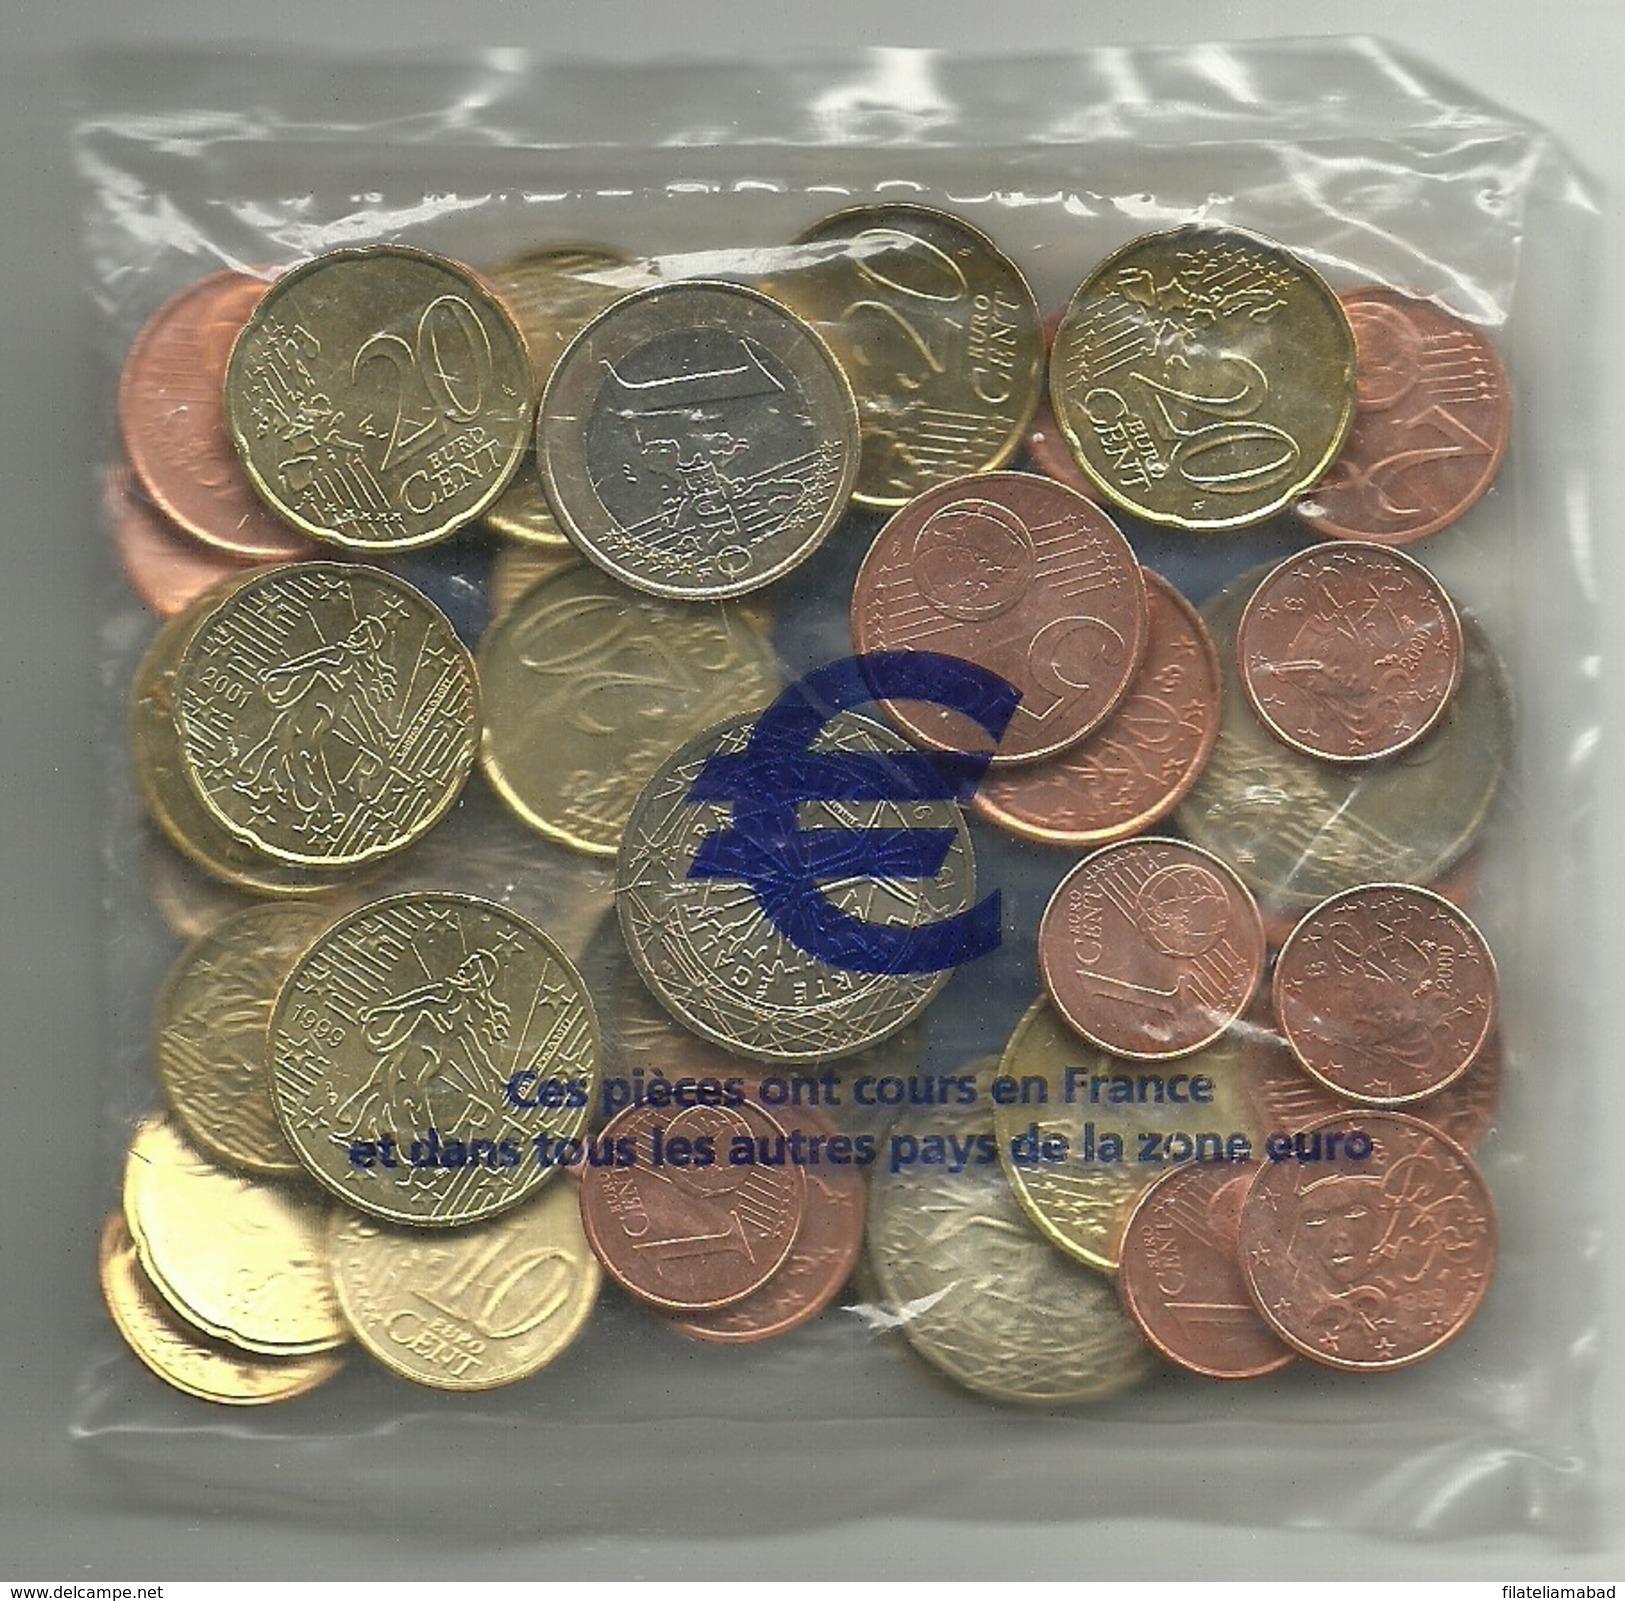 FRANCIA LOTE DE EUROS SIN CIRCULAR (M.C.5.17) - Monedas & Billetes